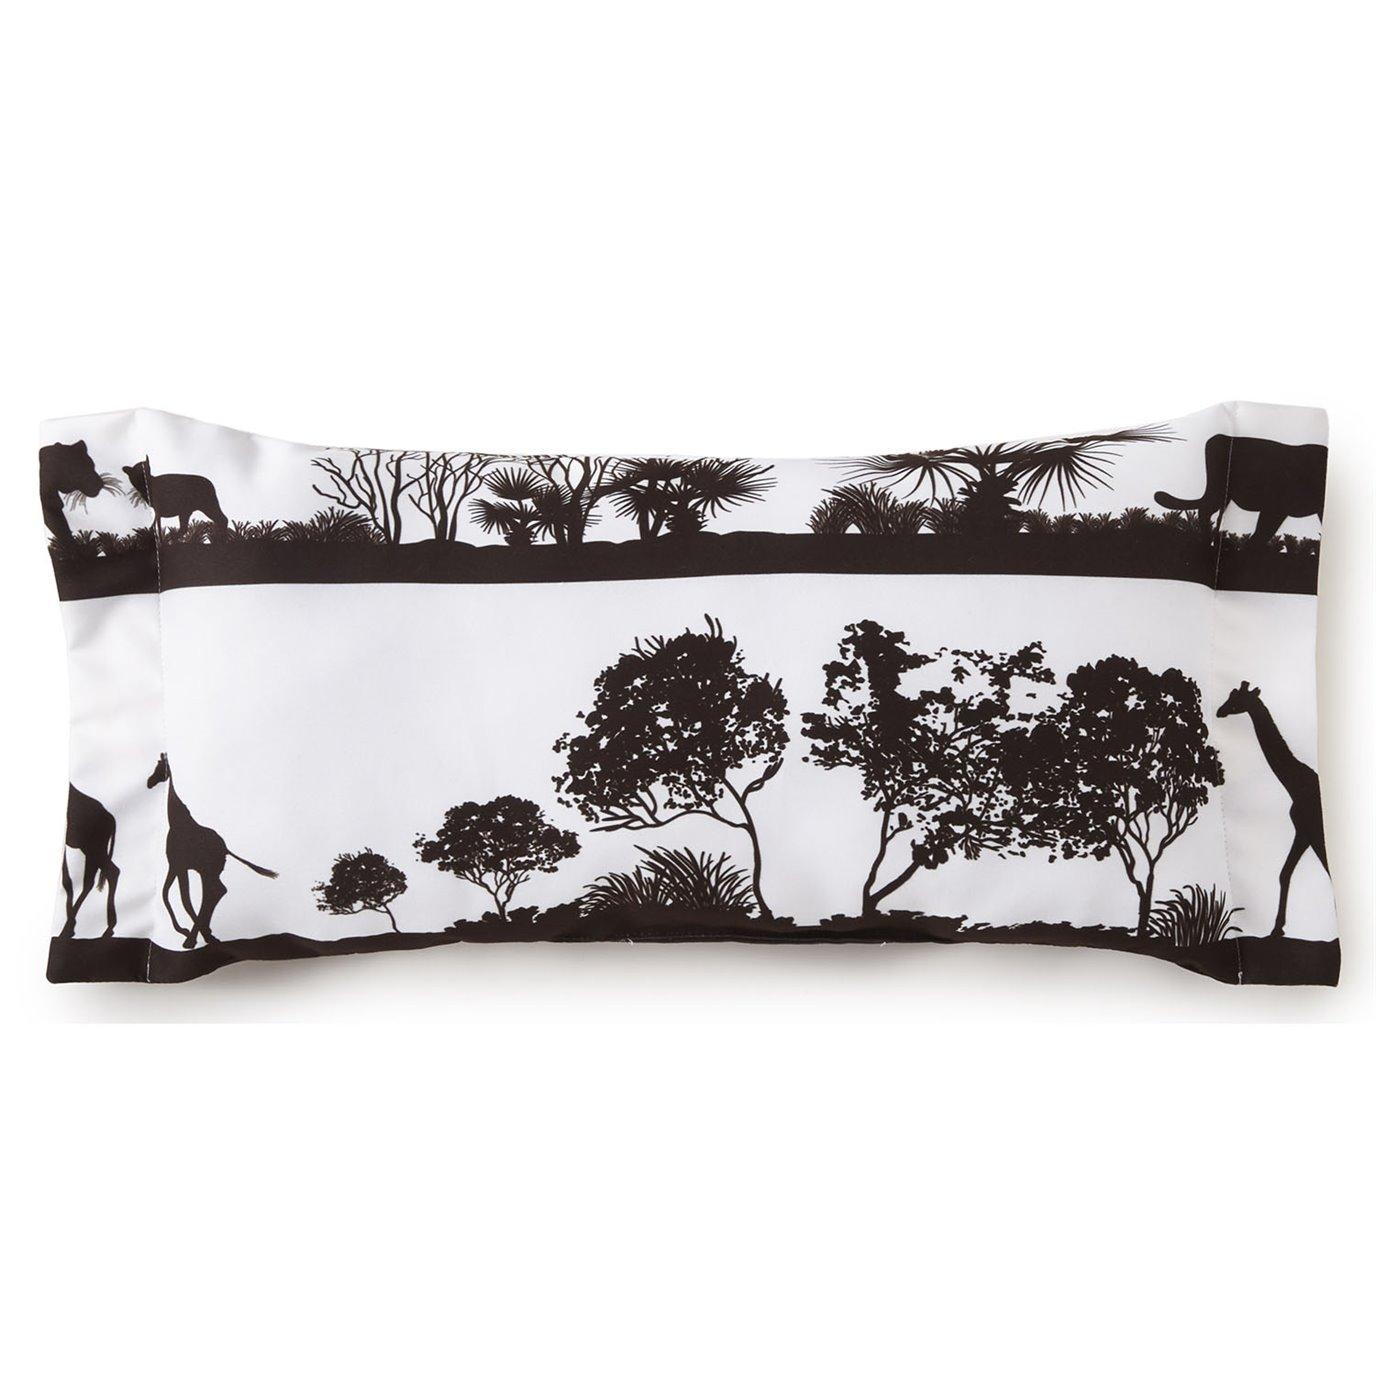 African Safari Long Rectangle Pillow - White Safari